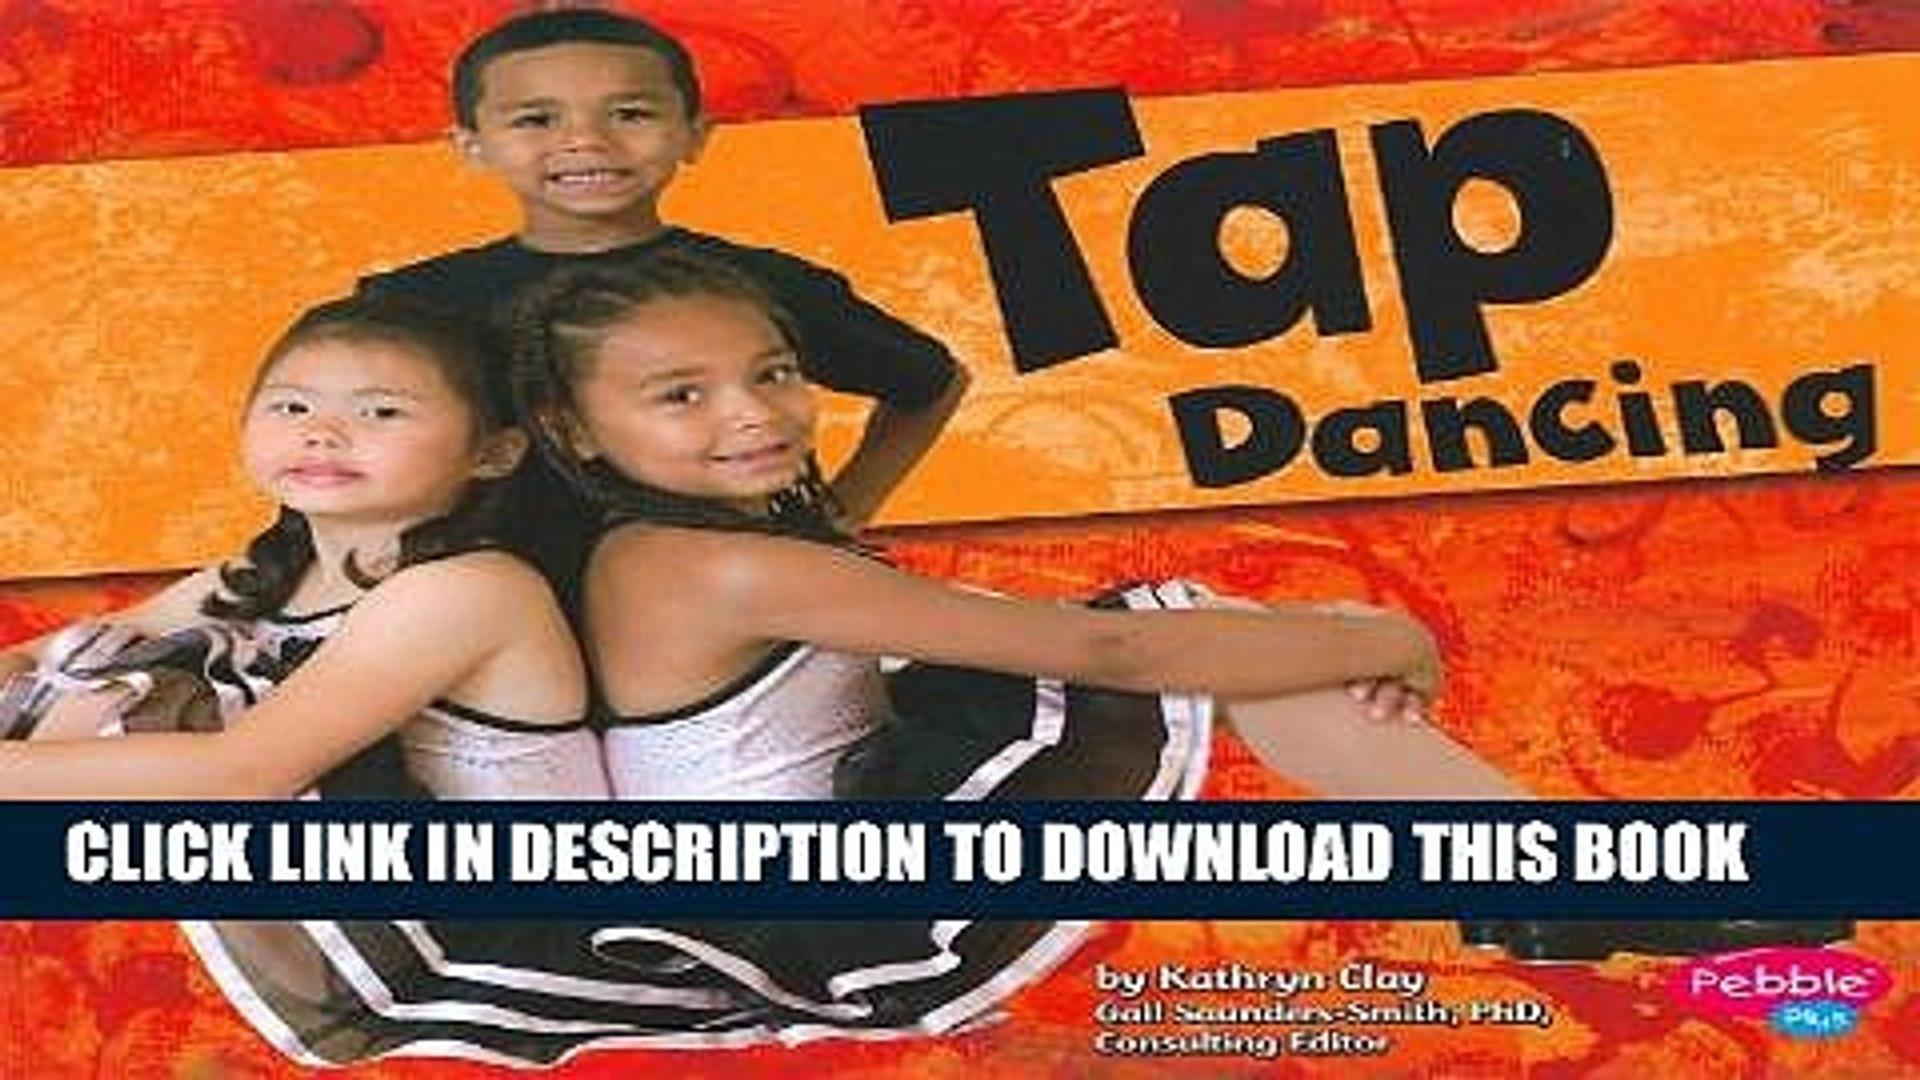 New Book Tap Dancing (Dance, Dance, Dance)